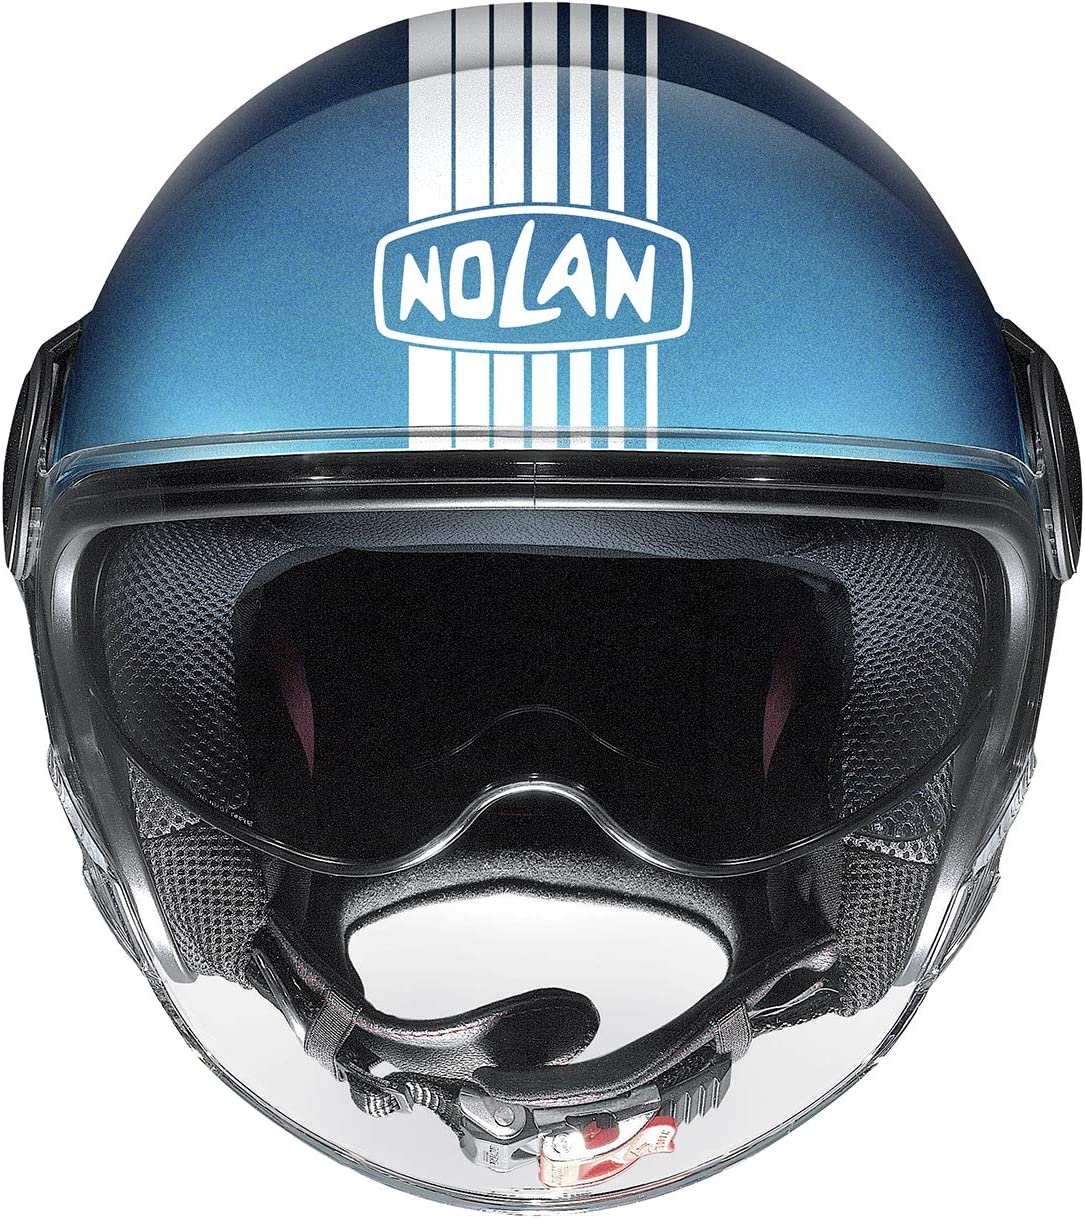 NOLAN CASCO N21 VISOR JOIE DE VI FLAT SAPPHIRE BLUE XXS